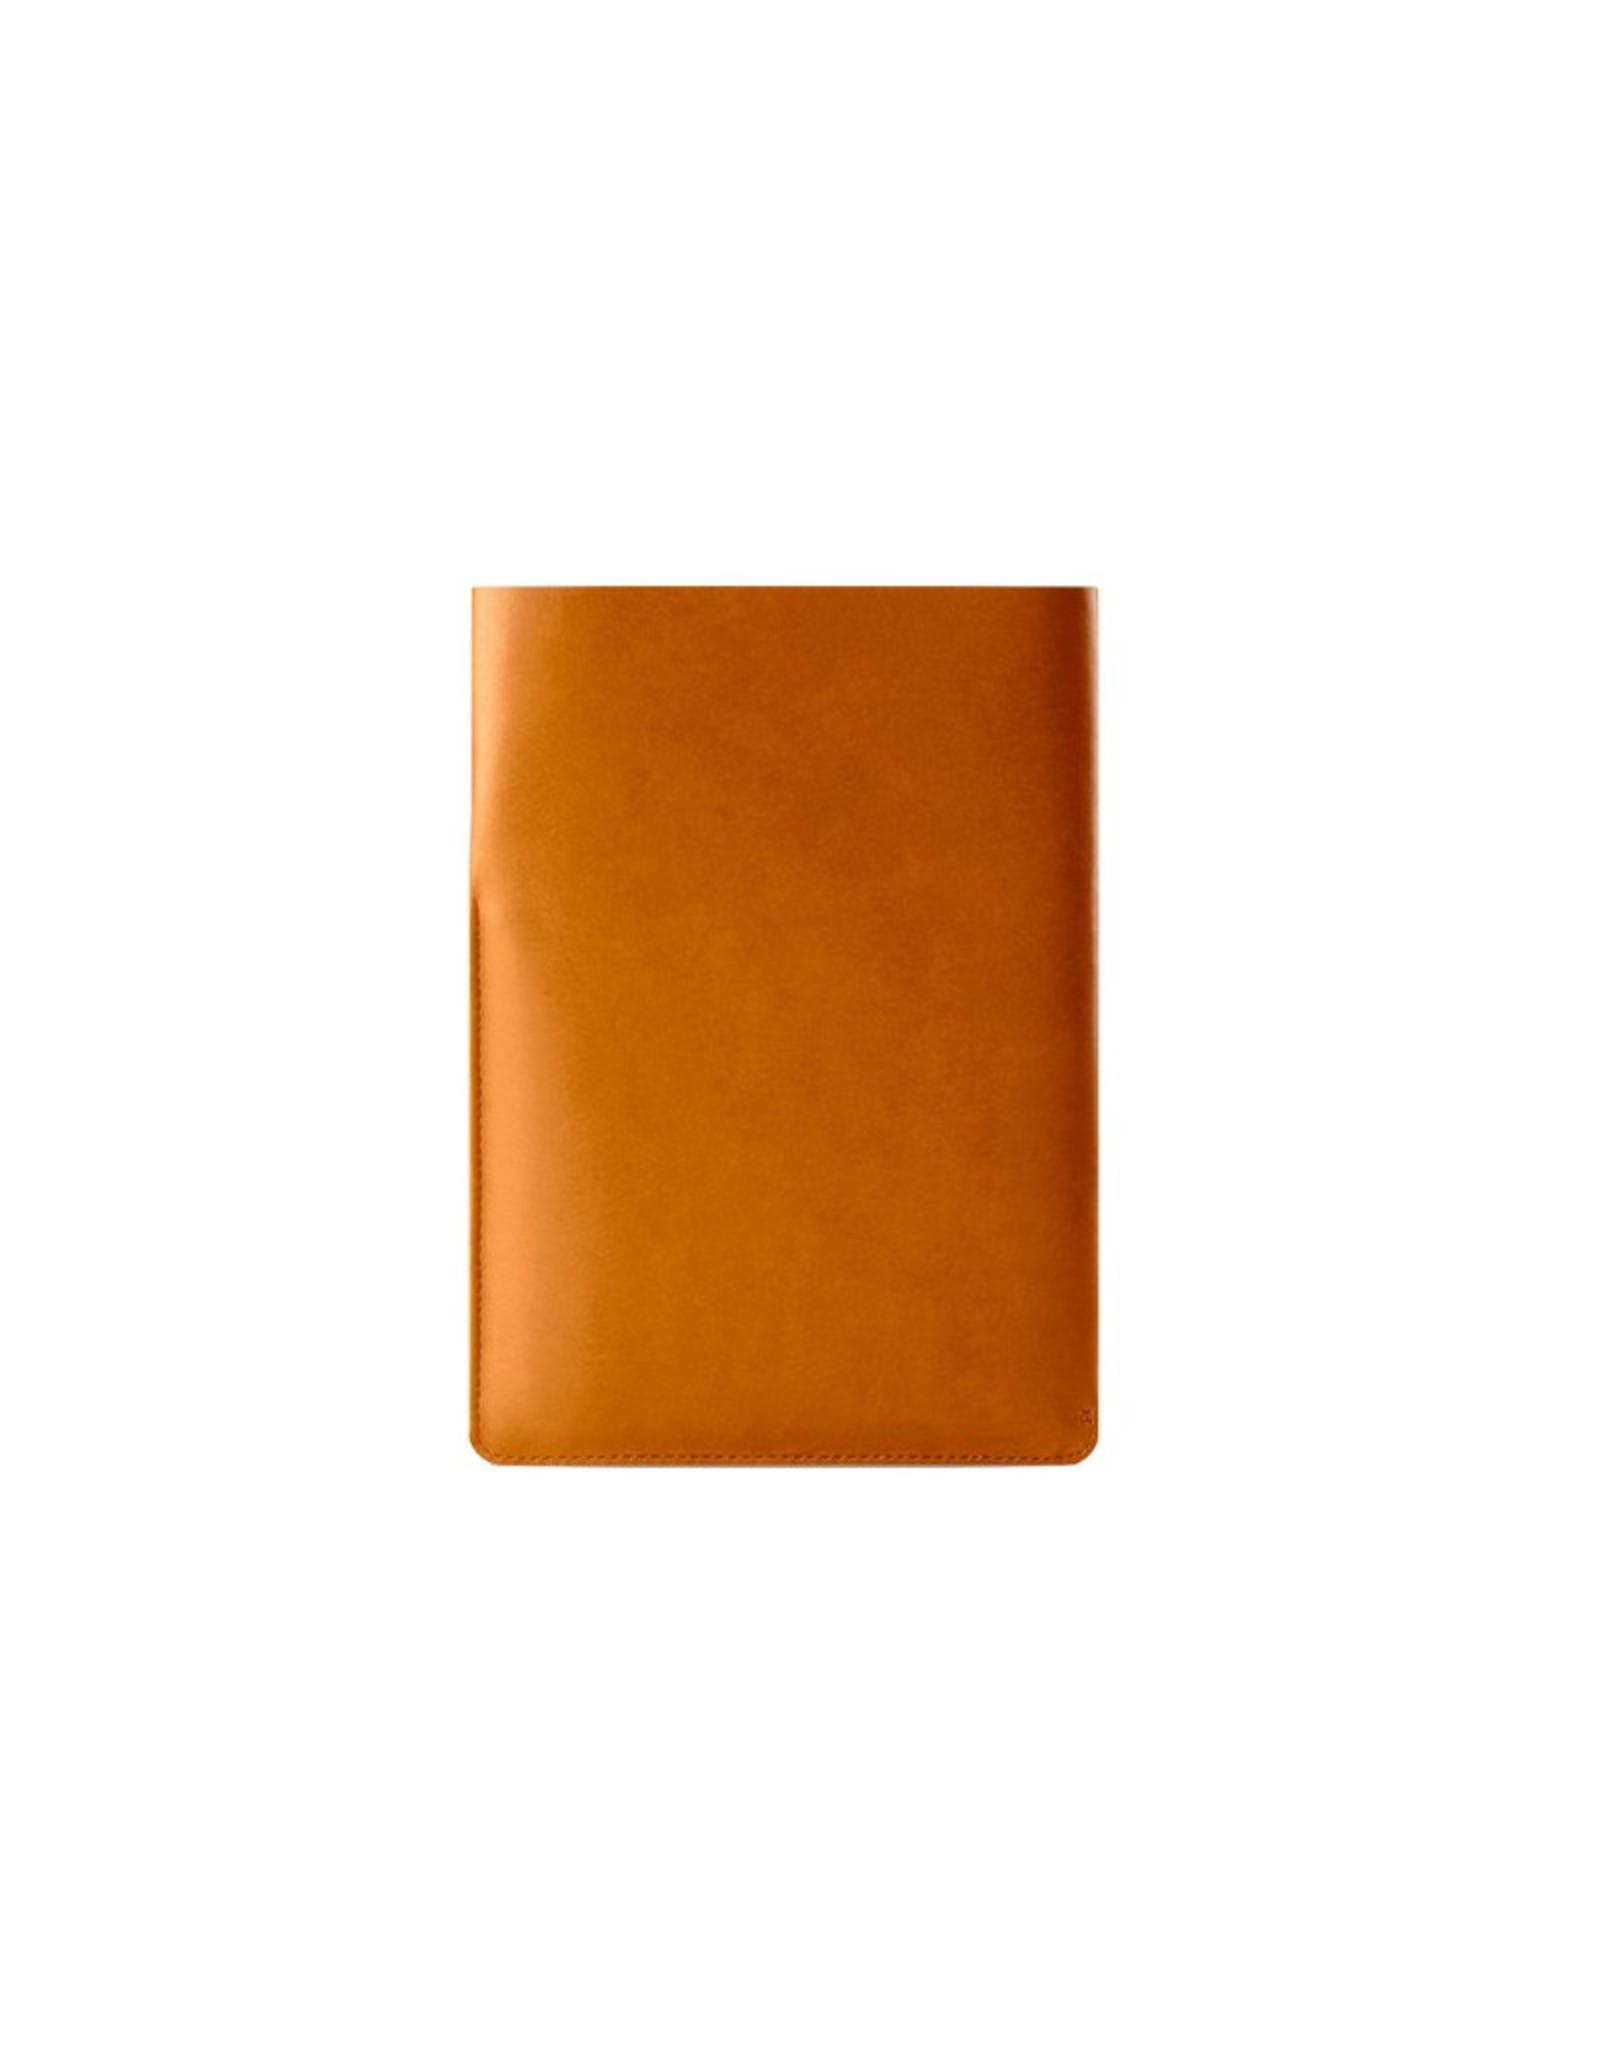 Mujjo Mujjo Slim Fit iPad Air Sleeve - Tan